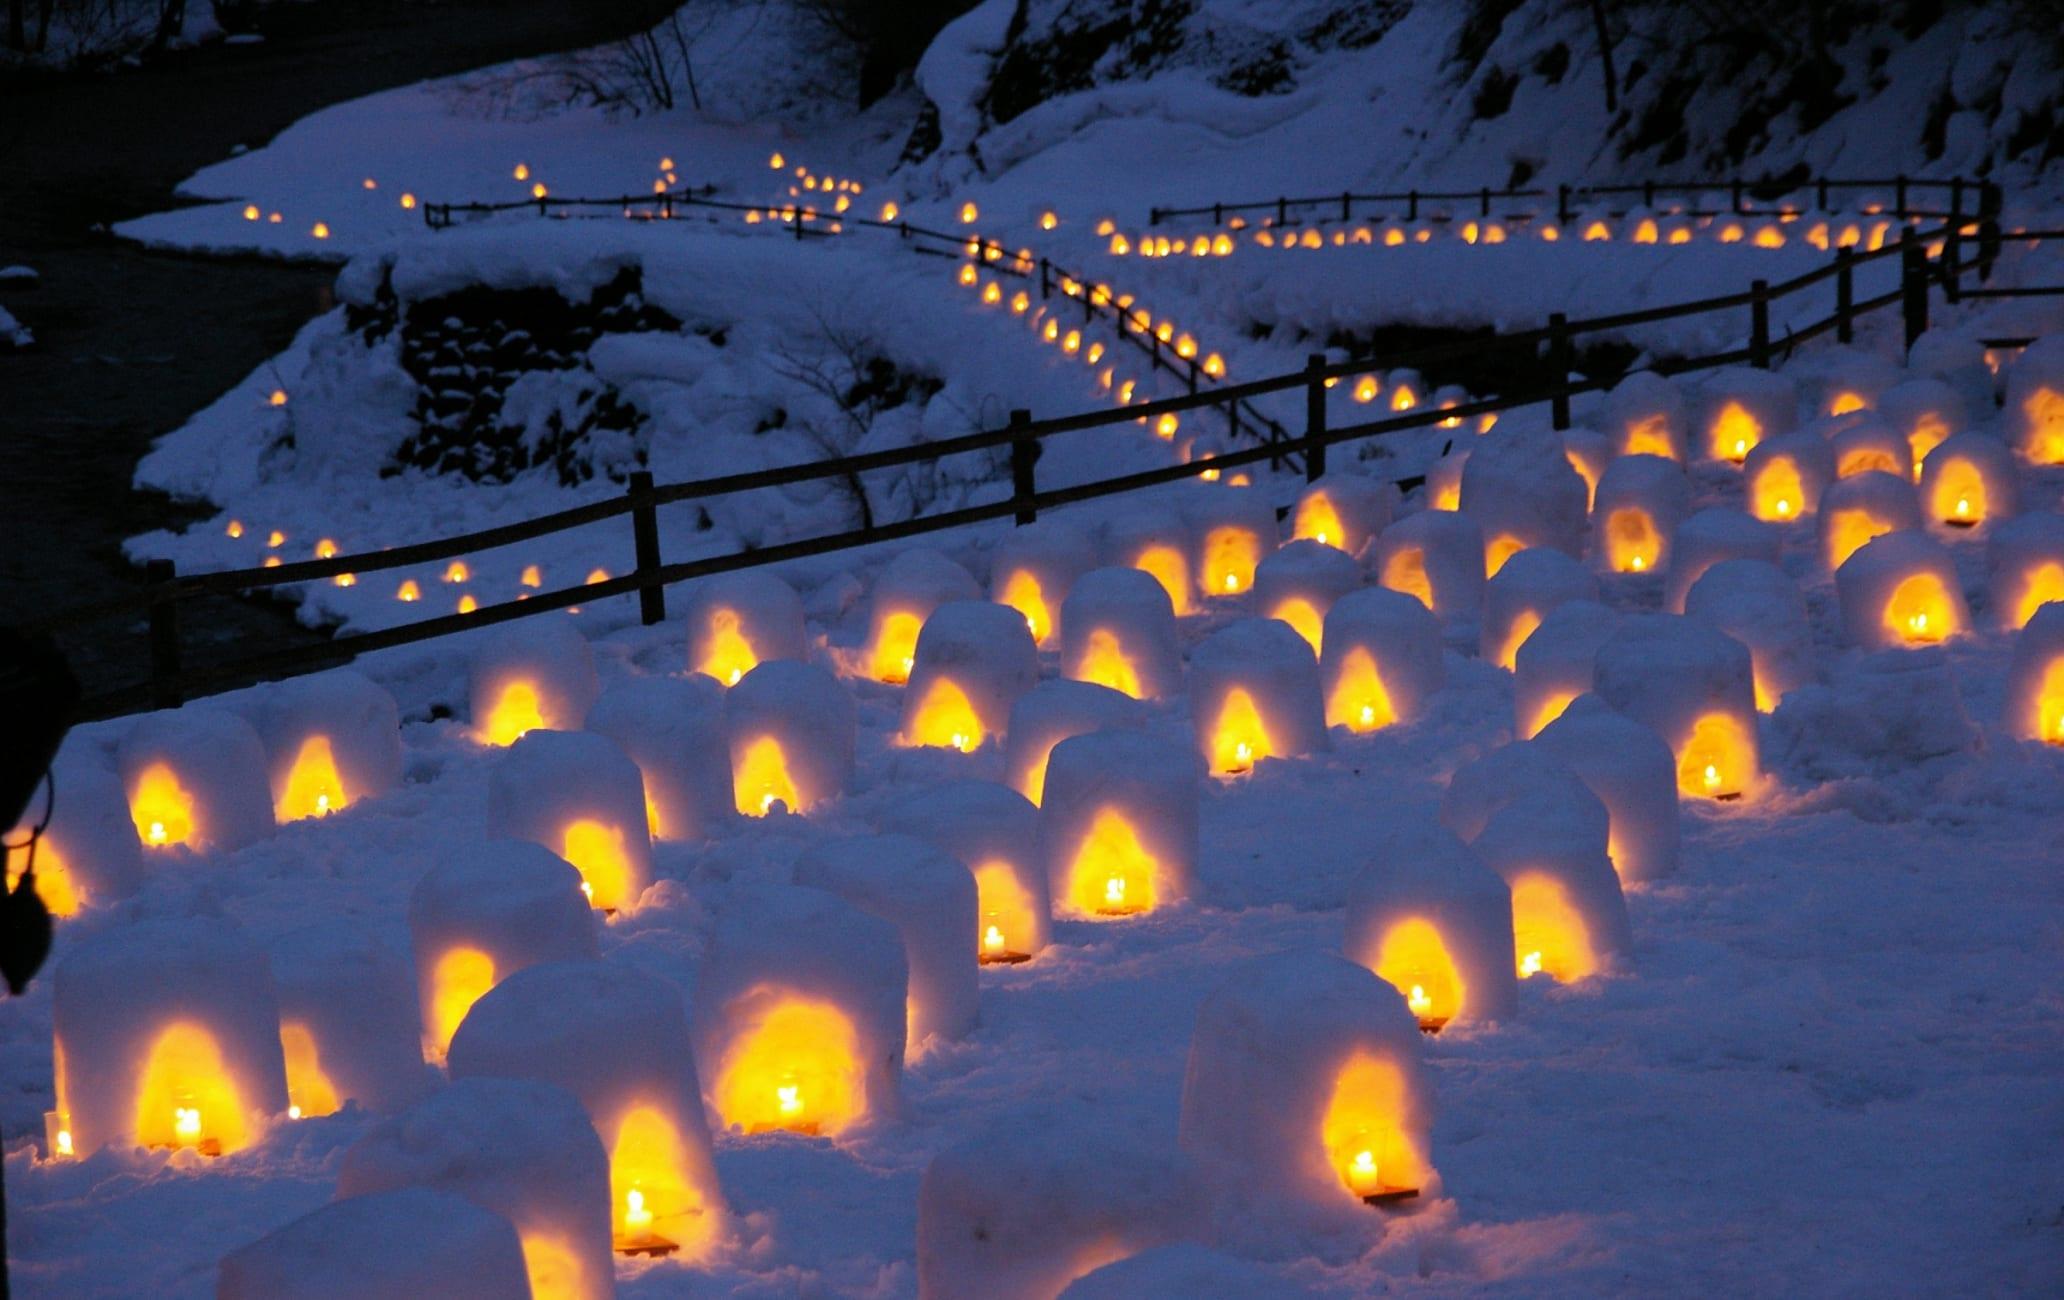 Yunishigawa-onsen KAMAKURA Snow House Festival